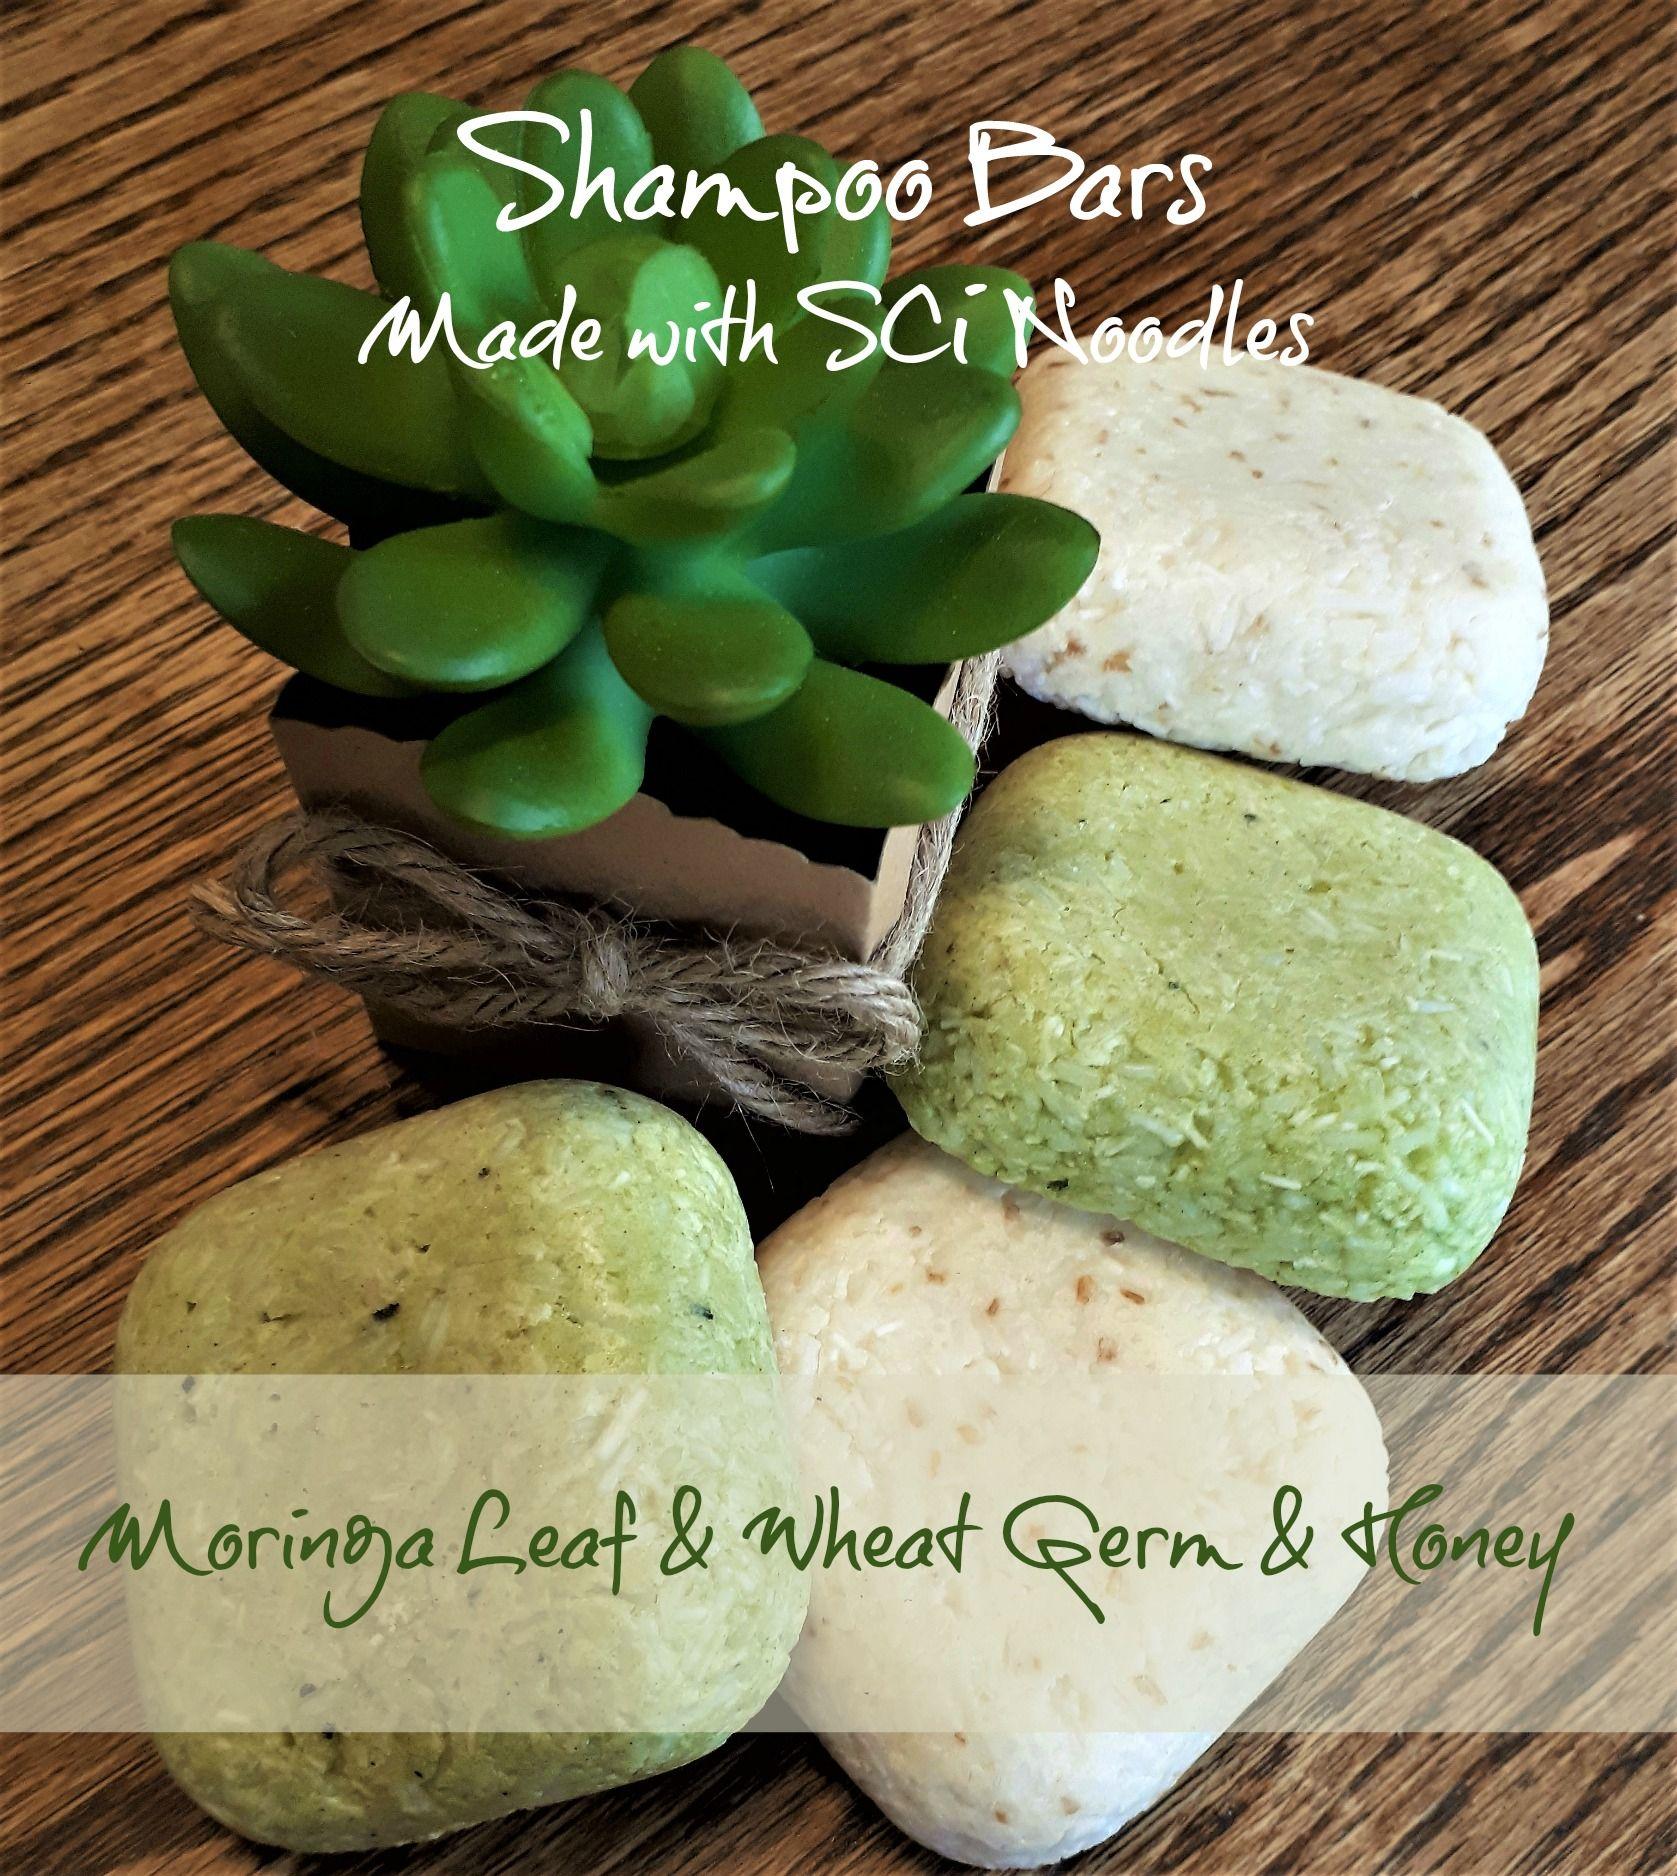 Diy Solid Shampoo Bars Sci Version 2 Recipes Solid Shampoo Bar Shampoo Bar Shampoo Bar Recipe